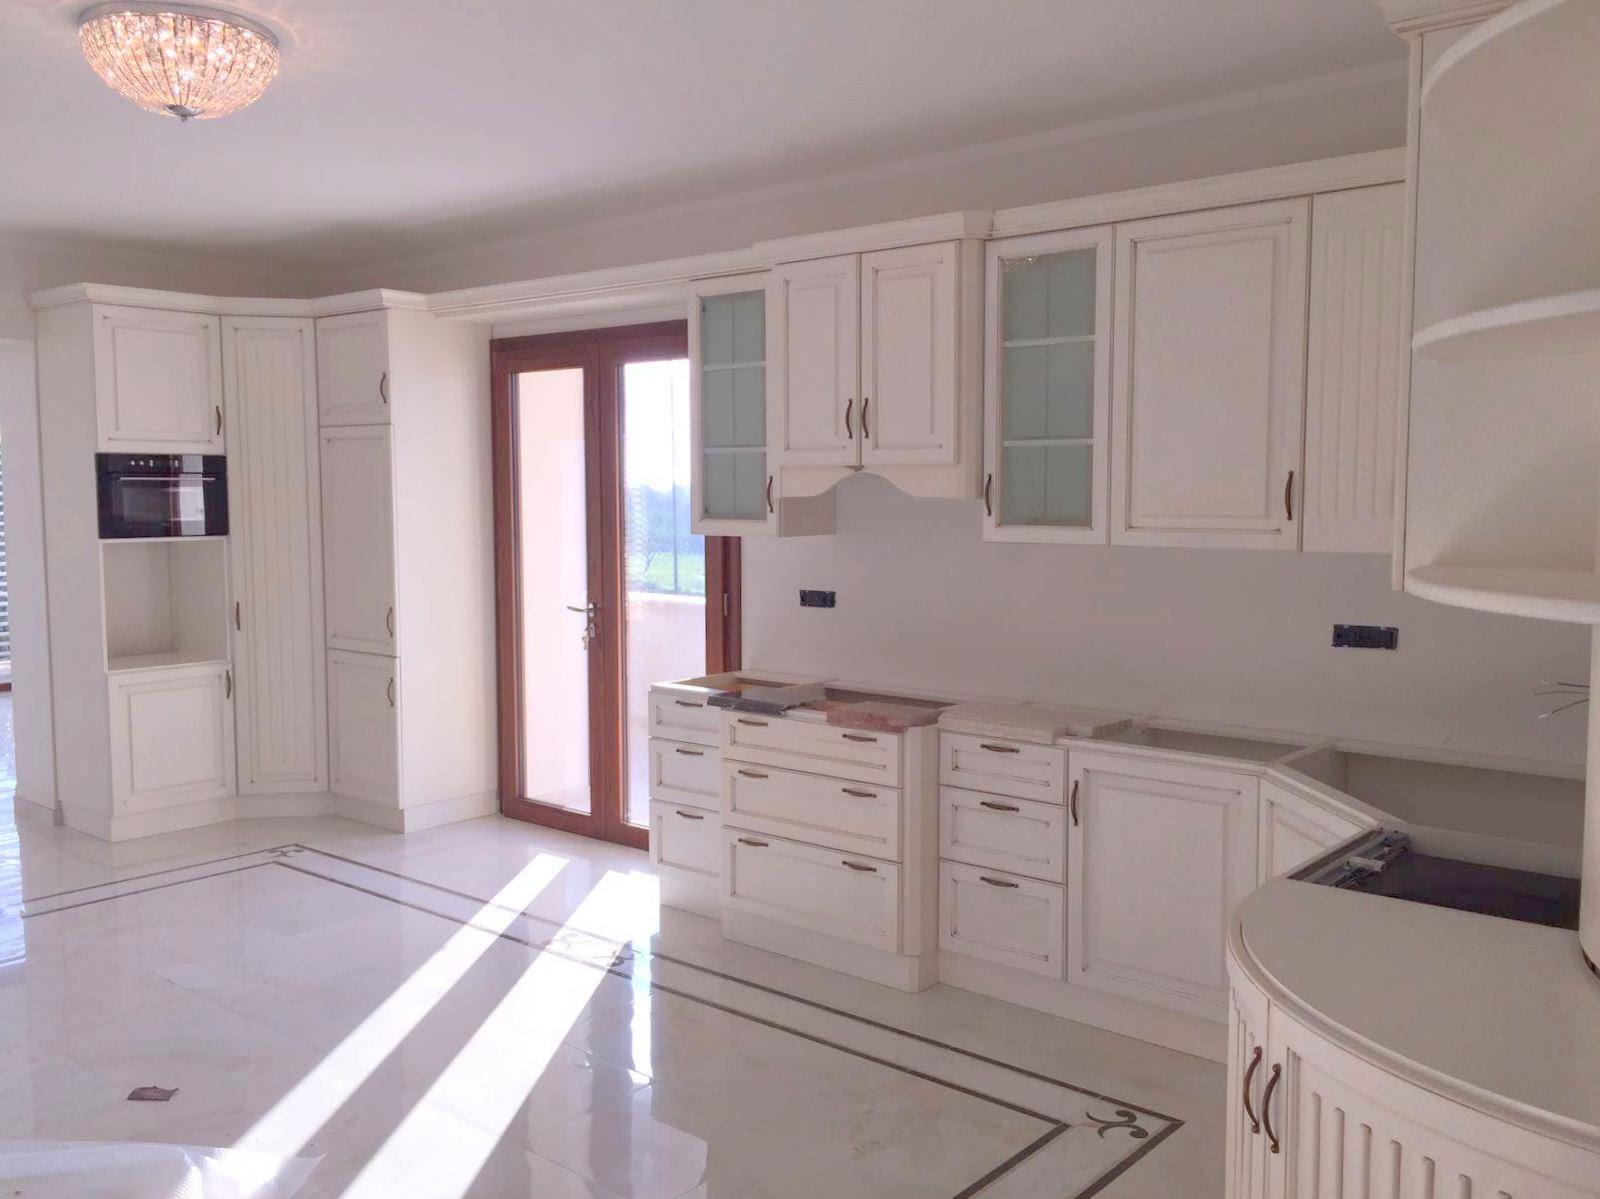 Arredo cucina classica bianca Milano